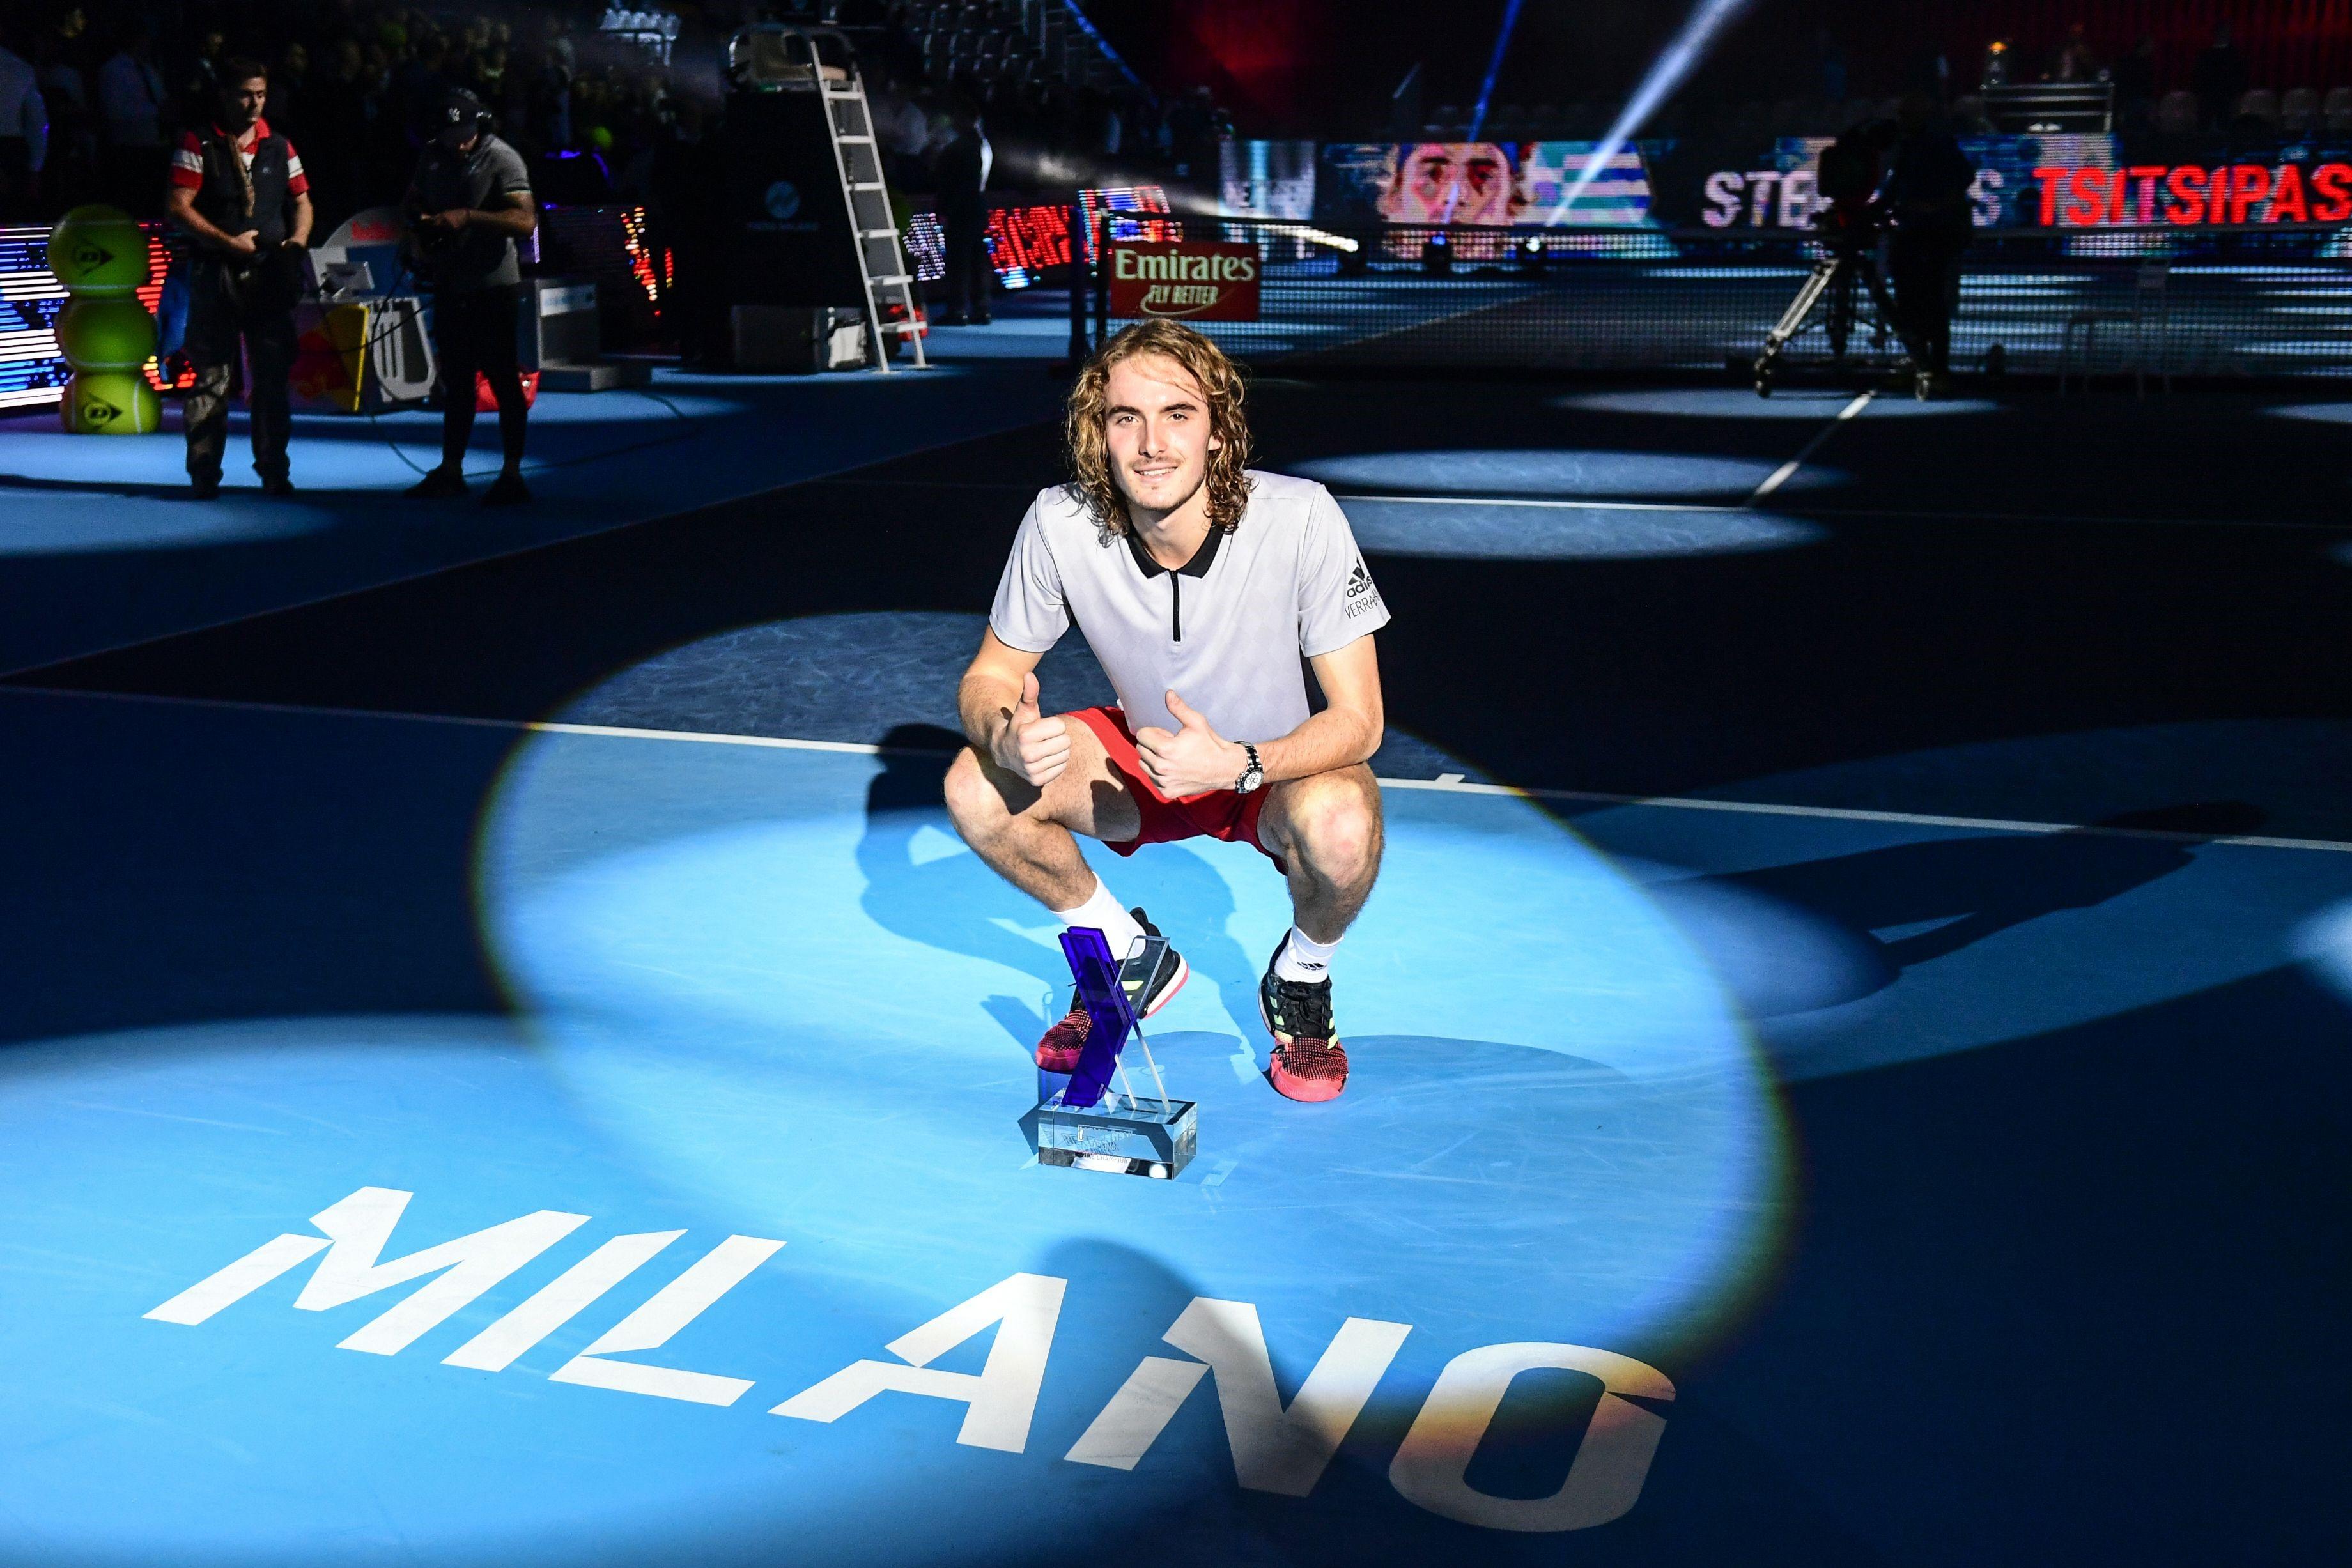 Stefanos Tsitsipas at the NextGen ATP Finals